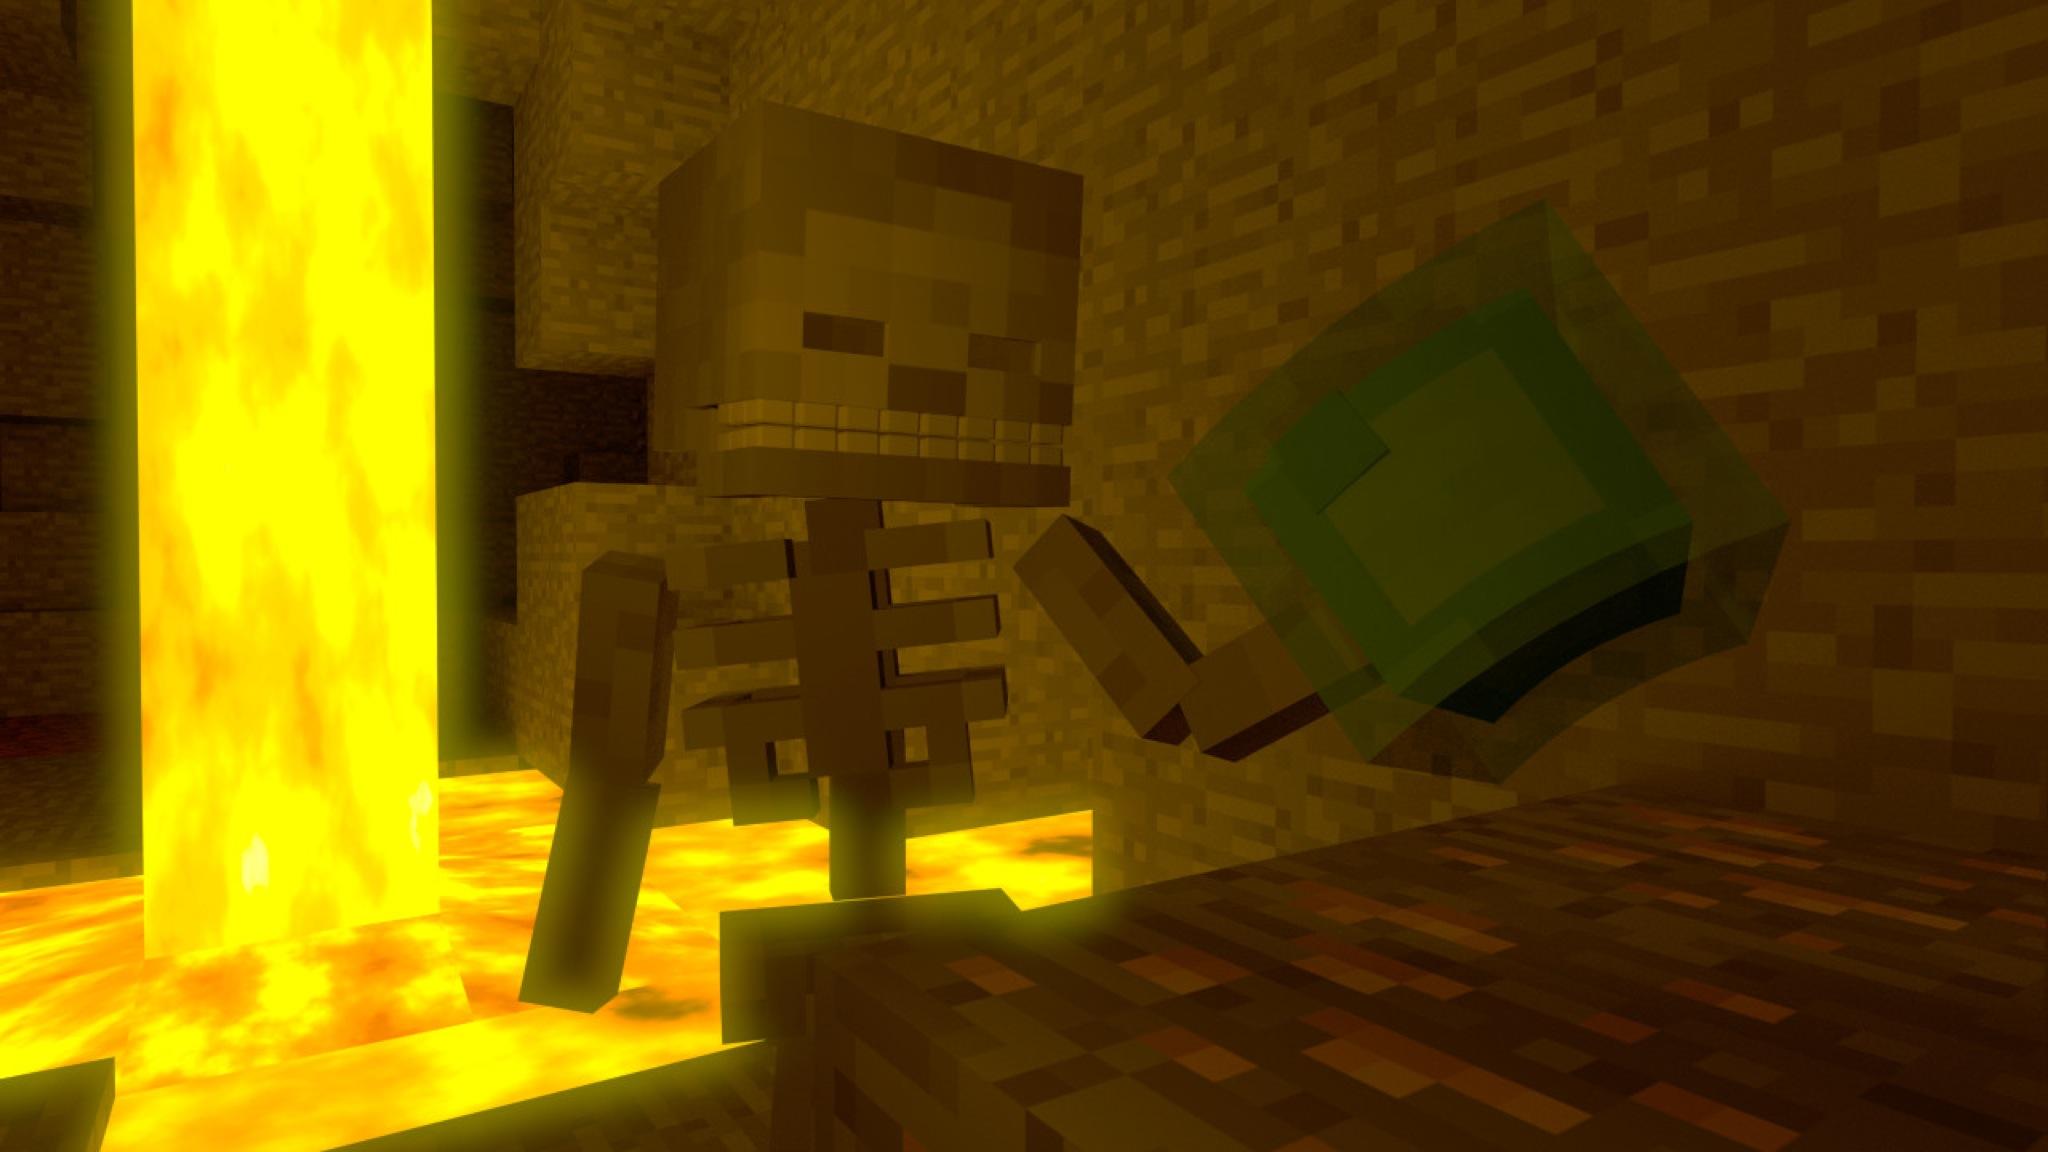 2048 By 1152 Of Minecraft: Minecraft Profil Fotoğrafları 2048×1152 Sorgusuna Uygun